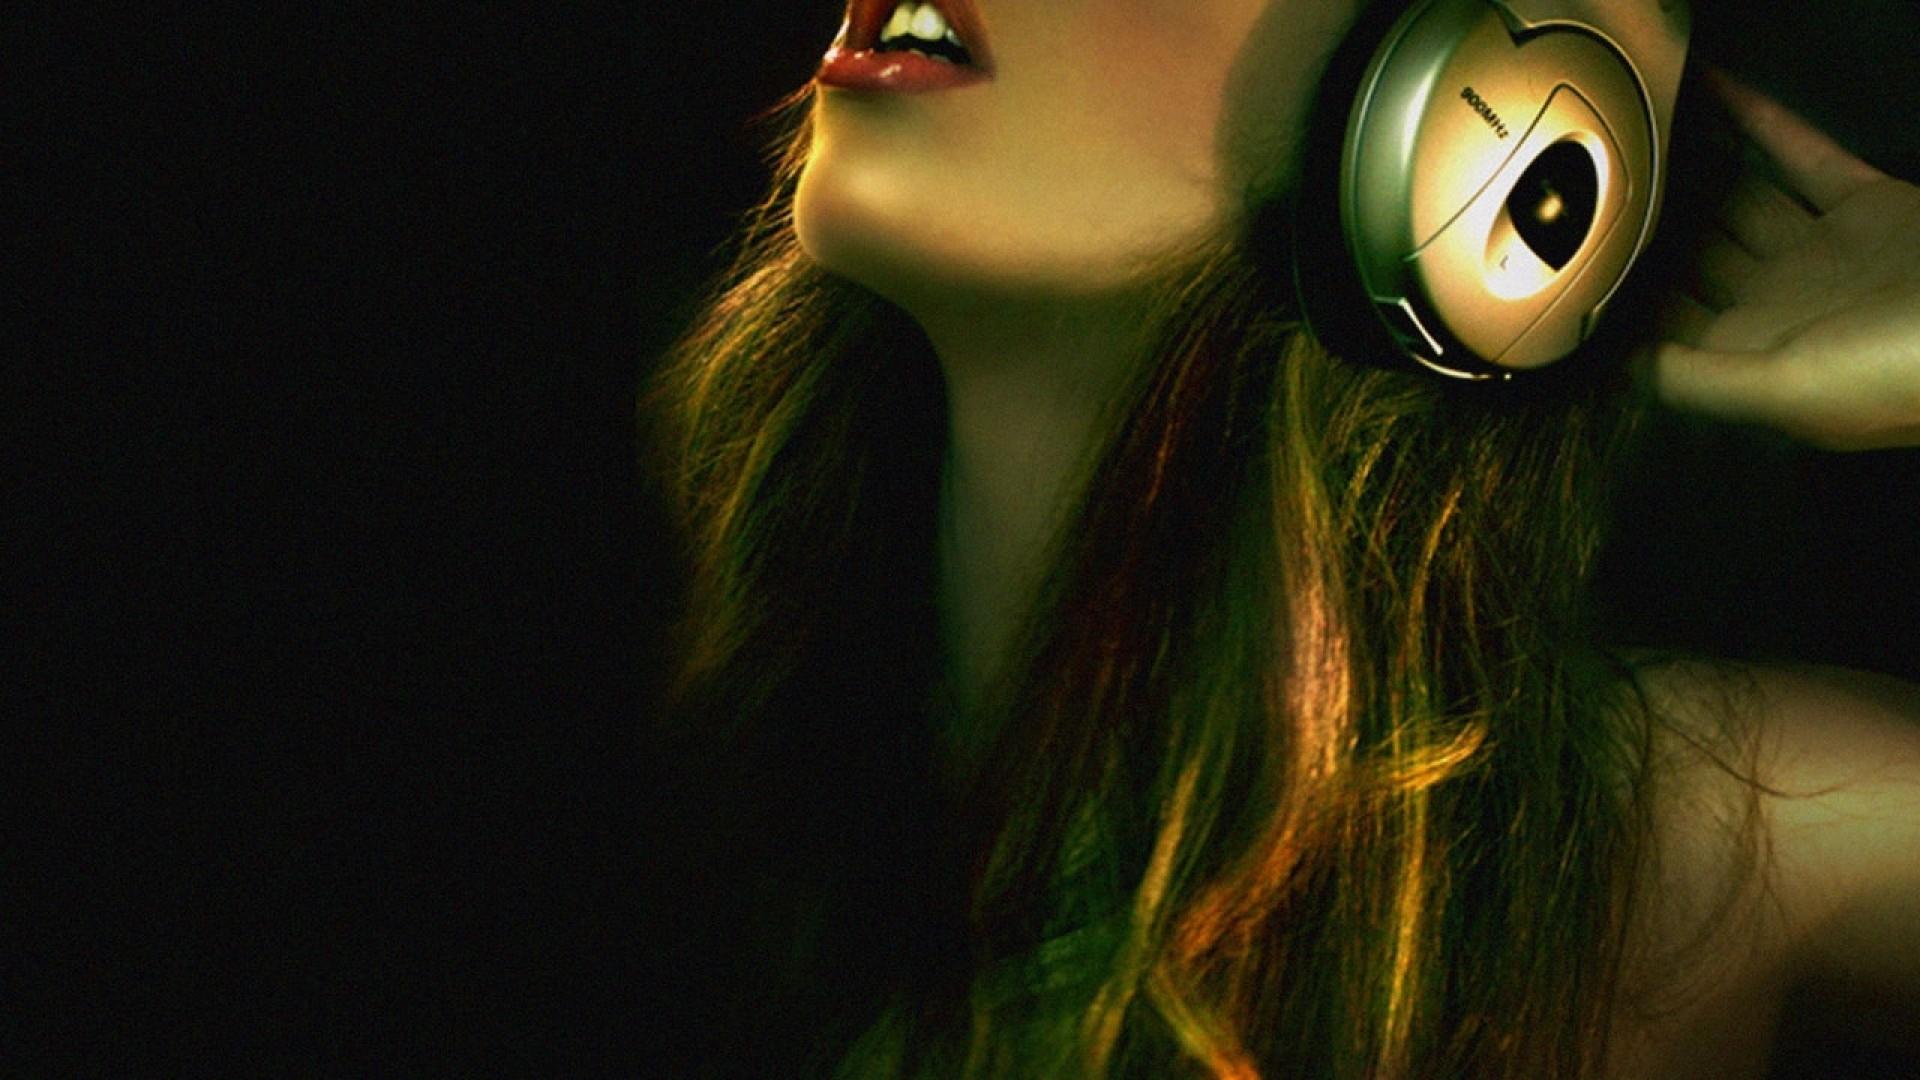 download music dj girl wallpaper 1920x1080